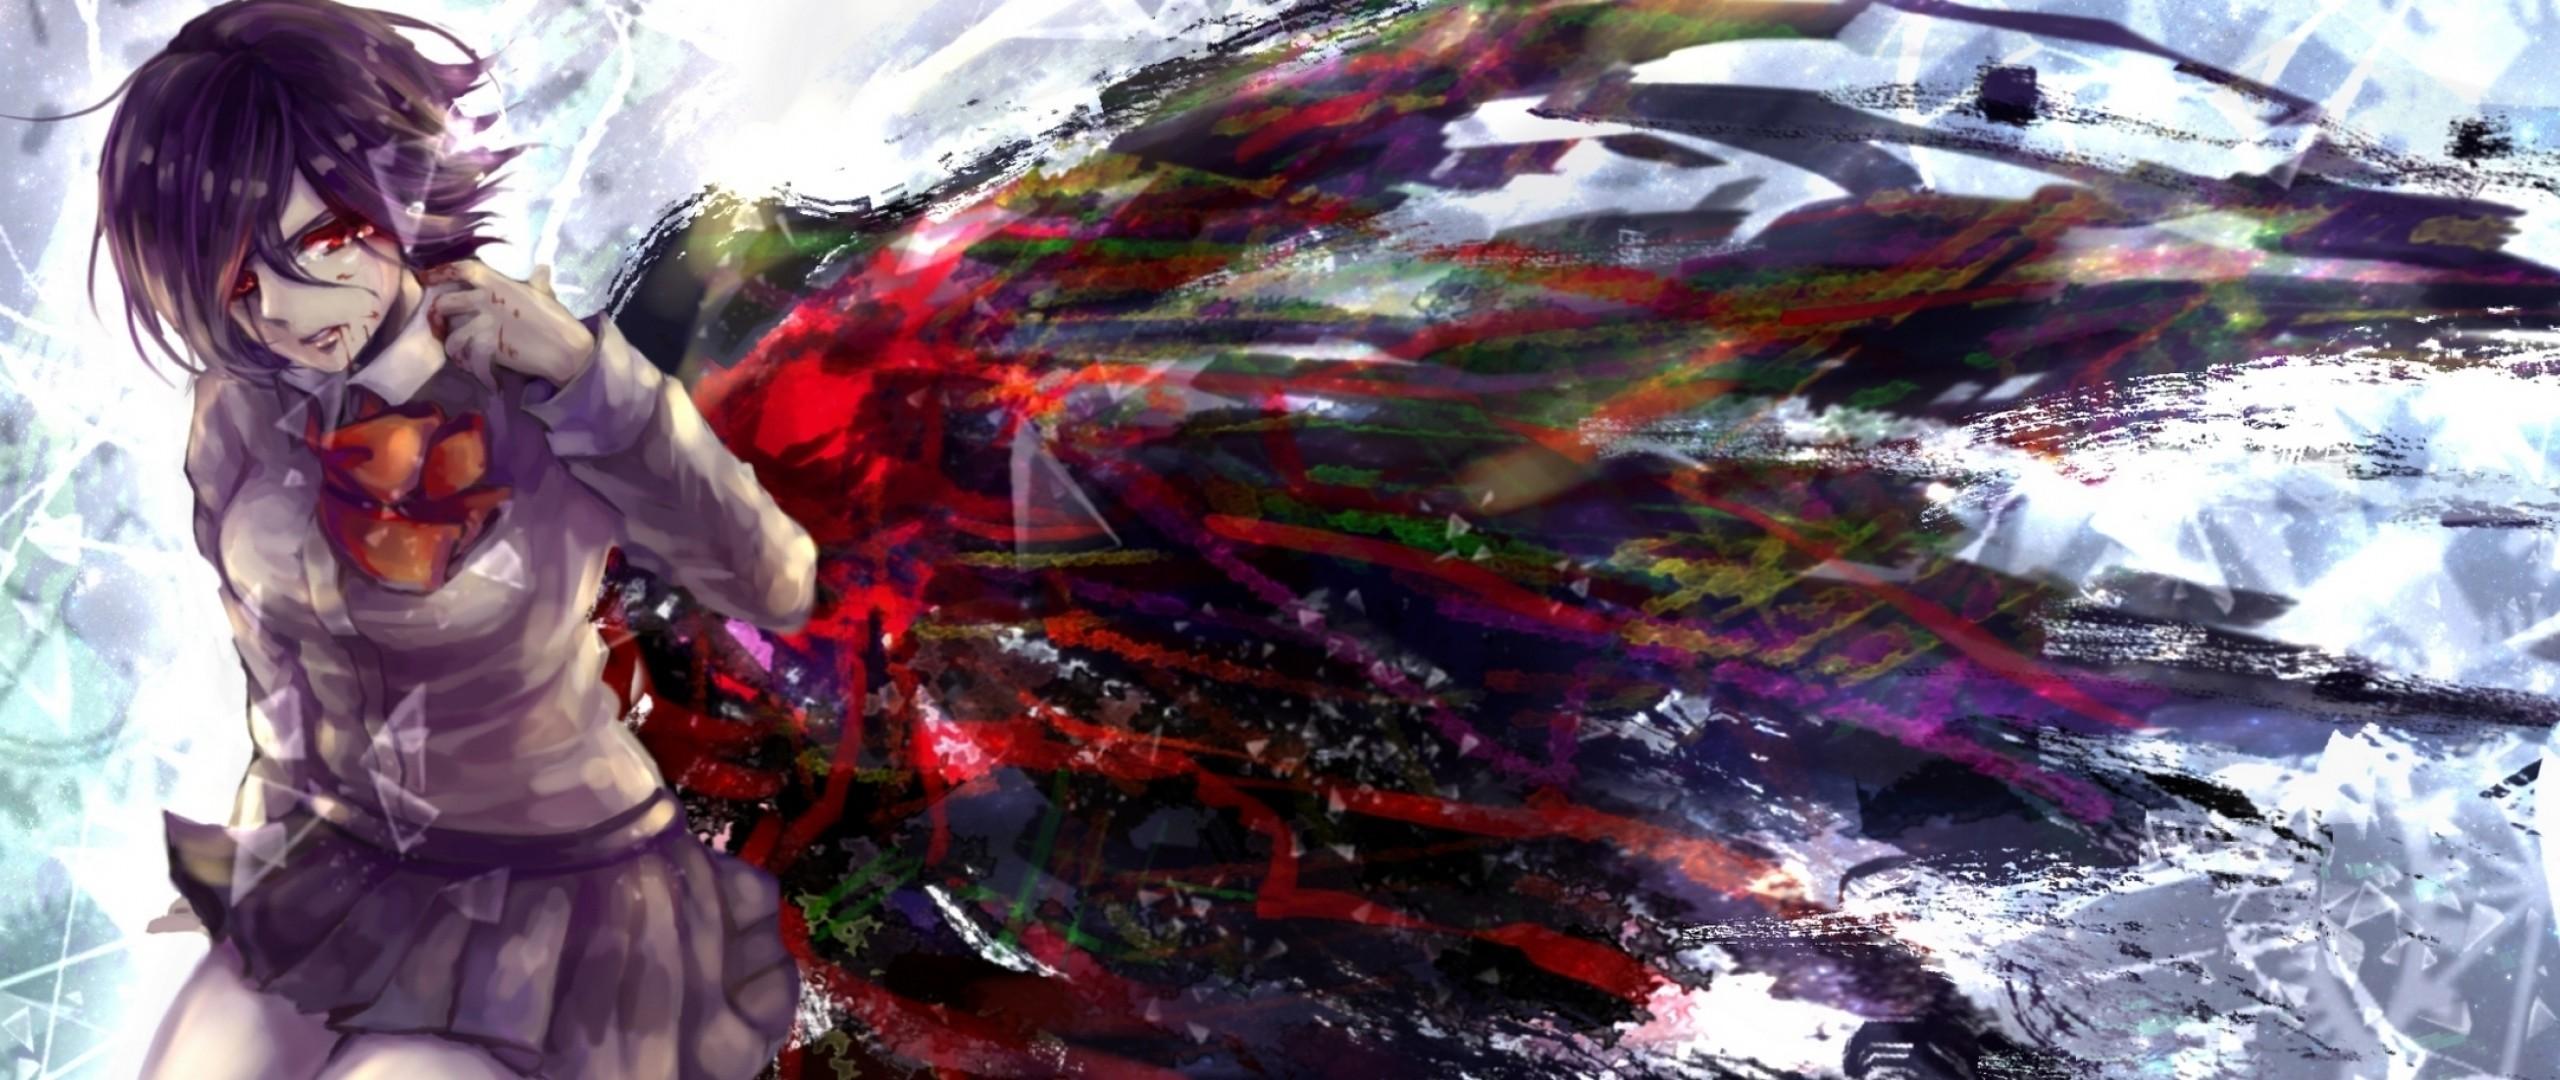 Wallpaper 4k Ultrawide Anime